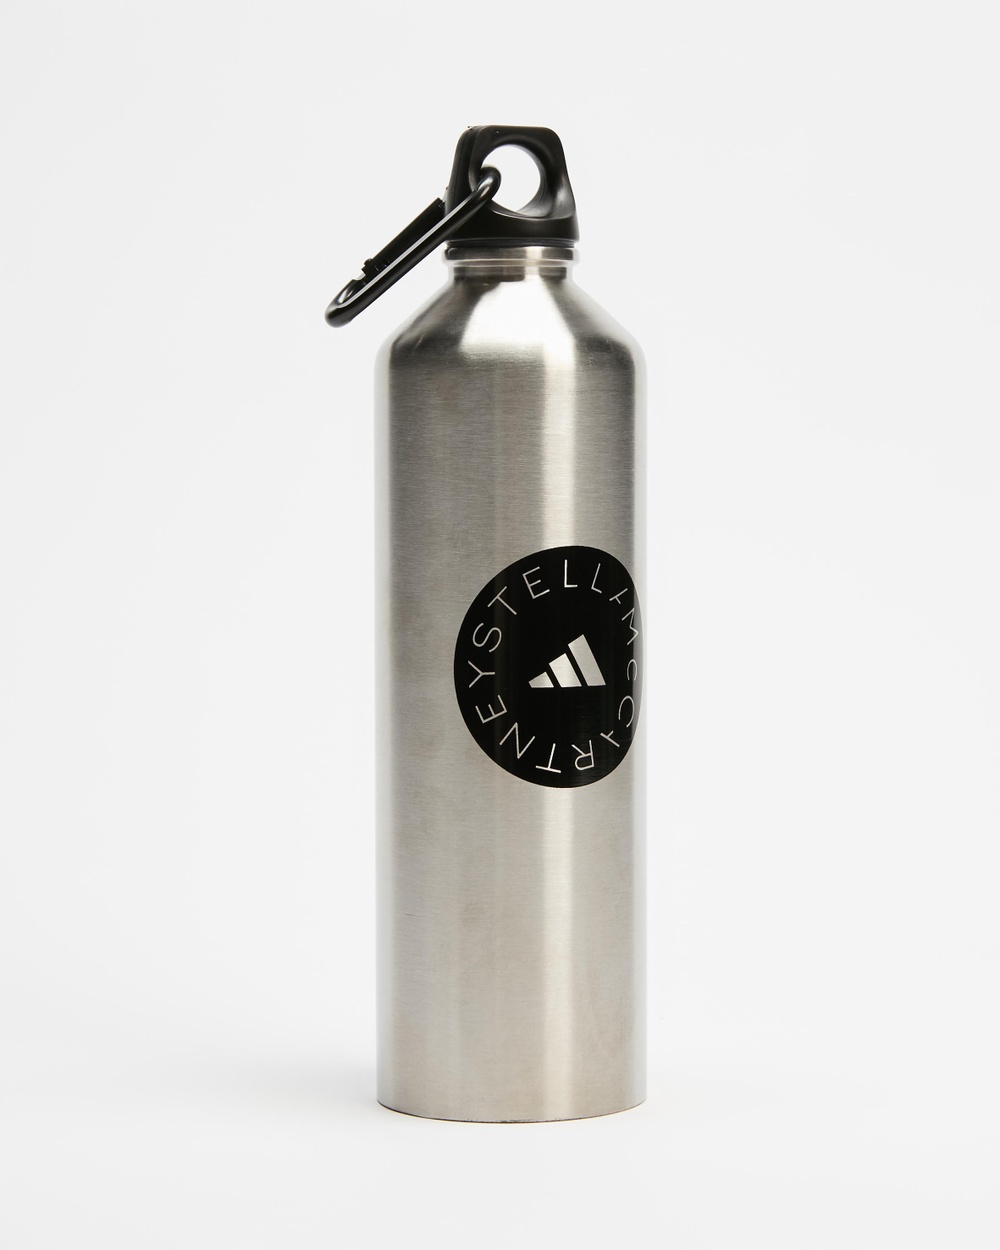 adidas by Stella McCartney ASMC Bottle Water Bottles Matte Silver & Black